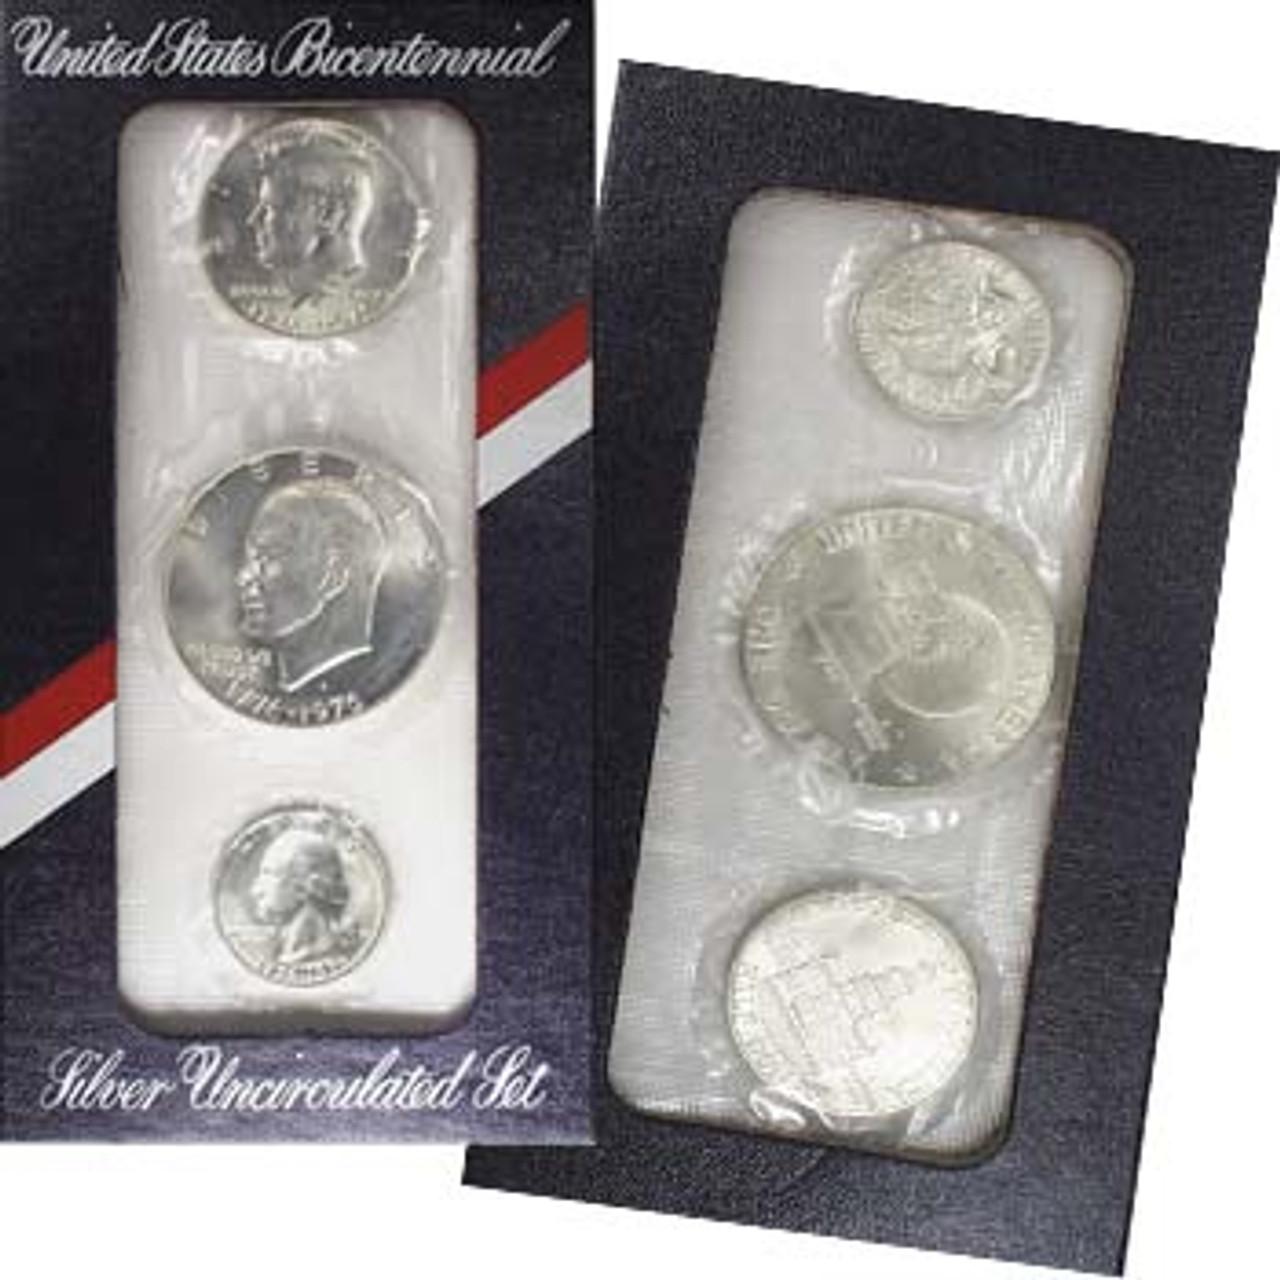 1976 Mint Set 40% Silver 3 Coins Image 1